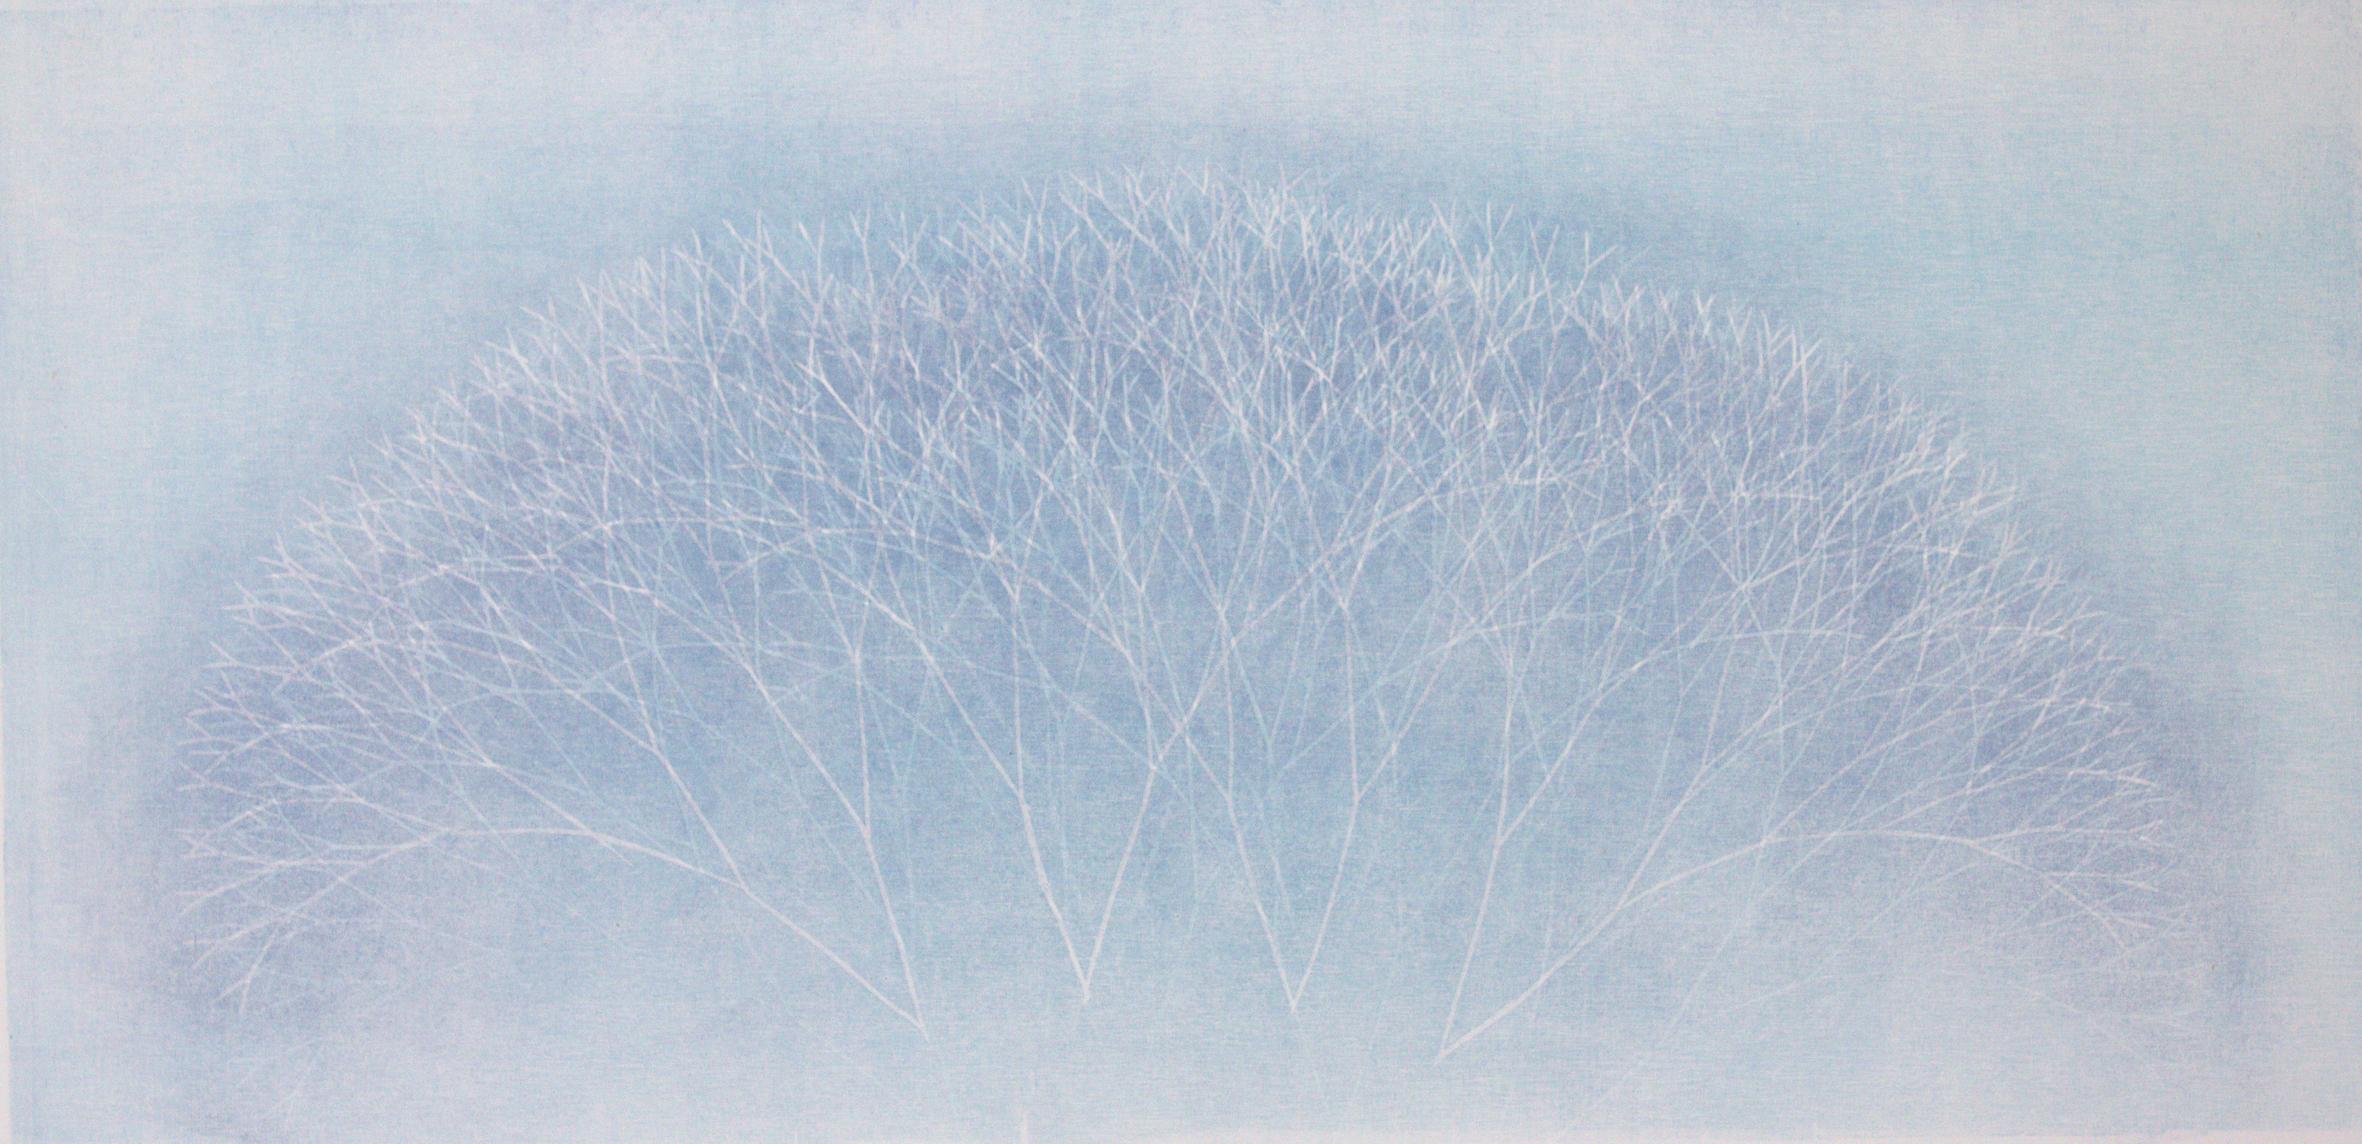 58. Talven valosta - Winter light